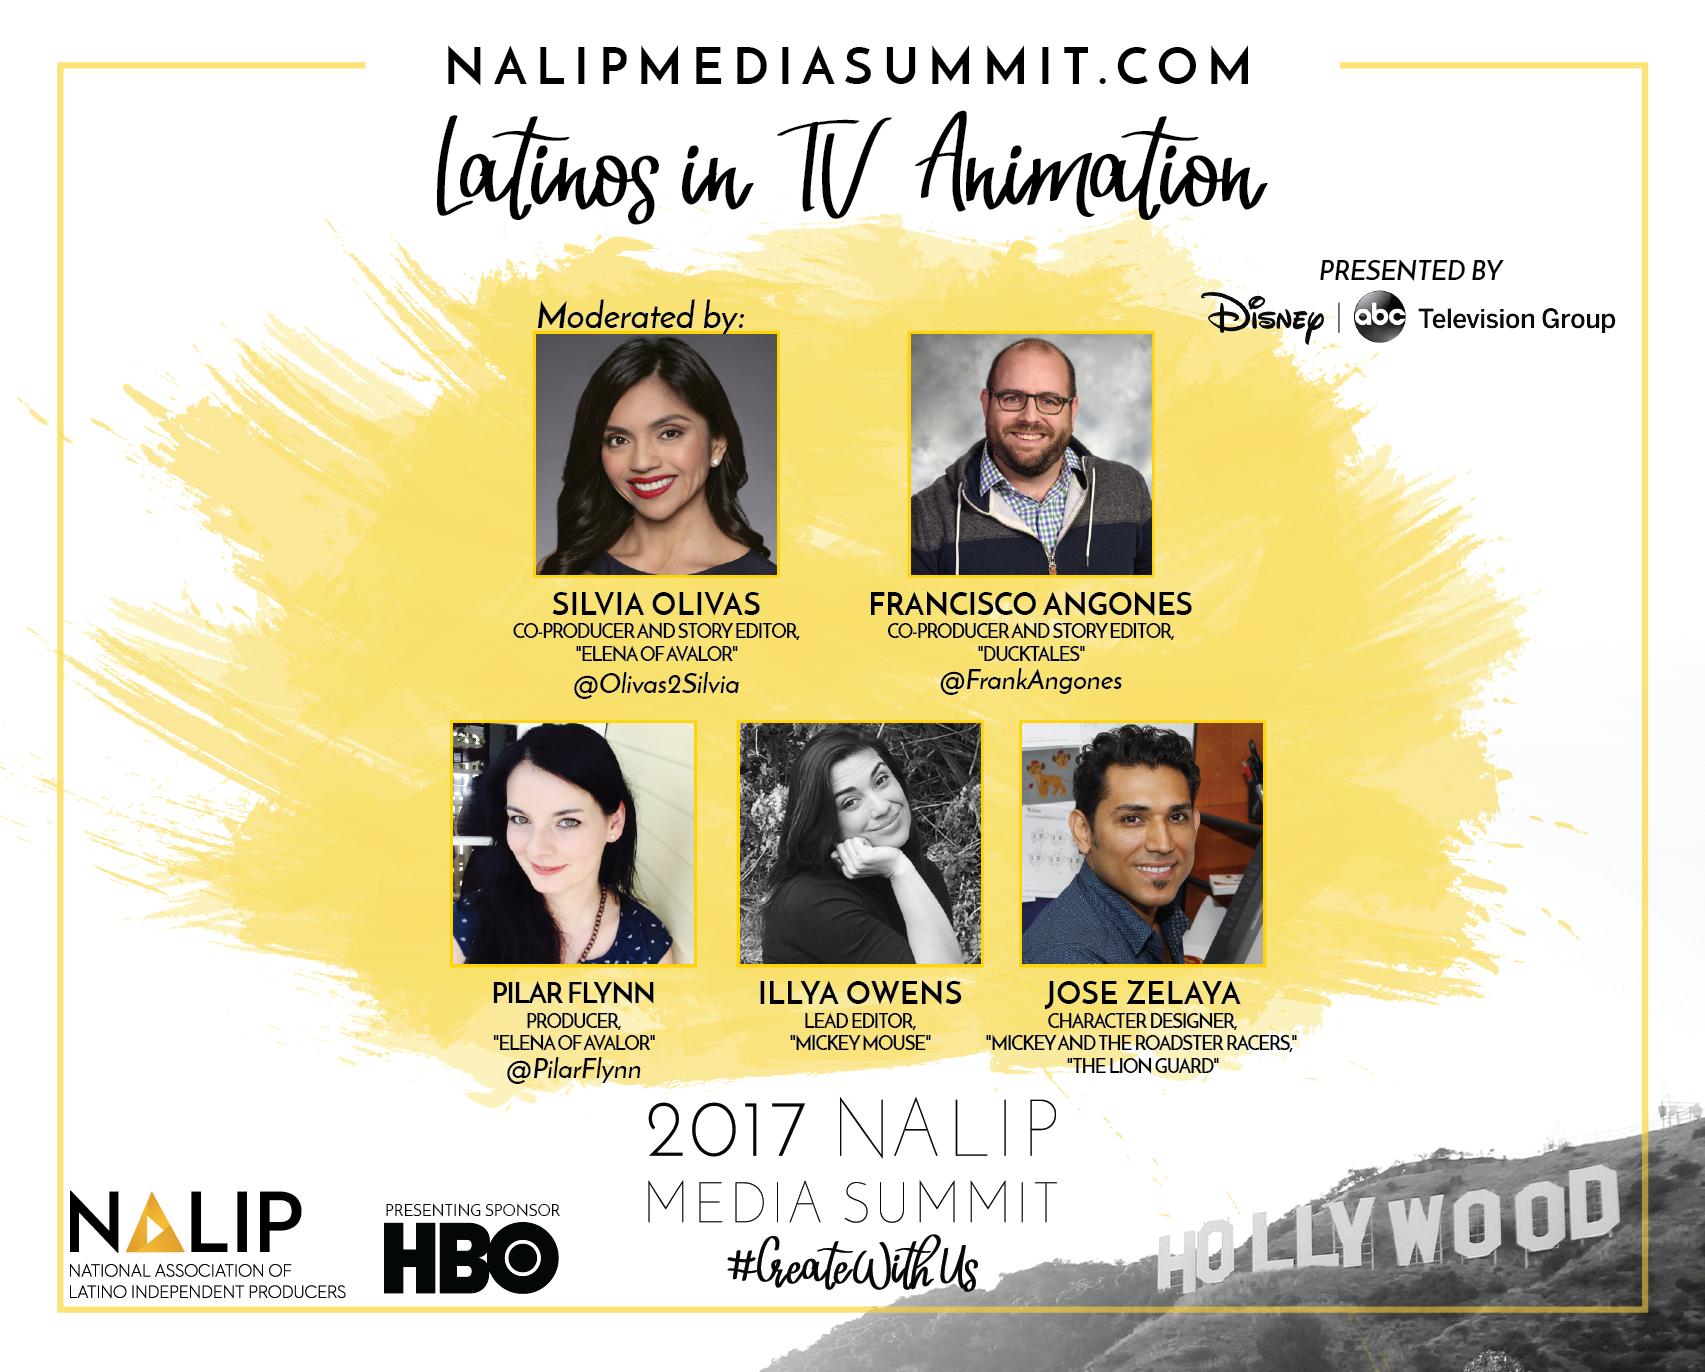 NALIP Announces Disney ABC Television Group Media Summit Panel